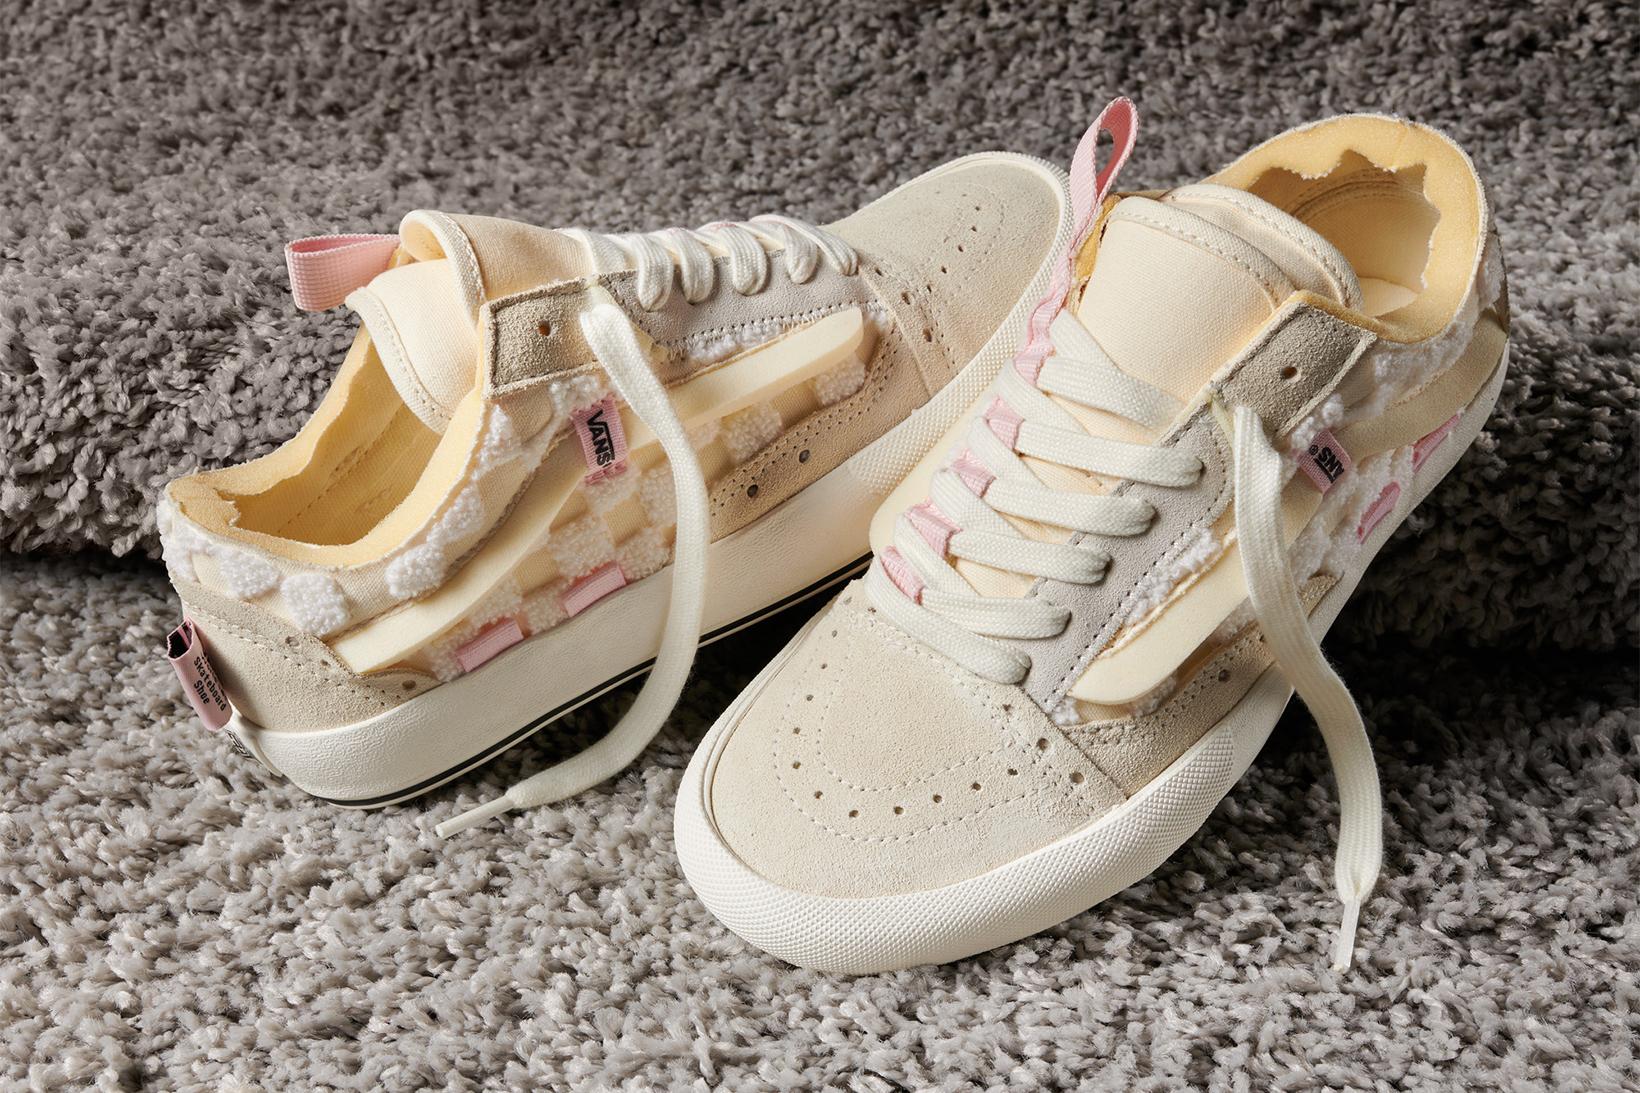 Vans Old Skool Pink Cream Color Classic Era